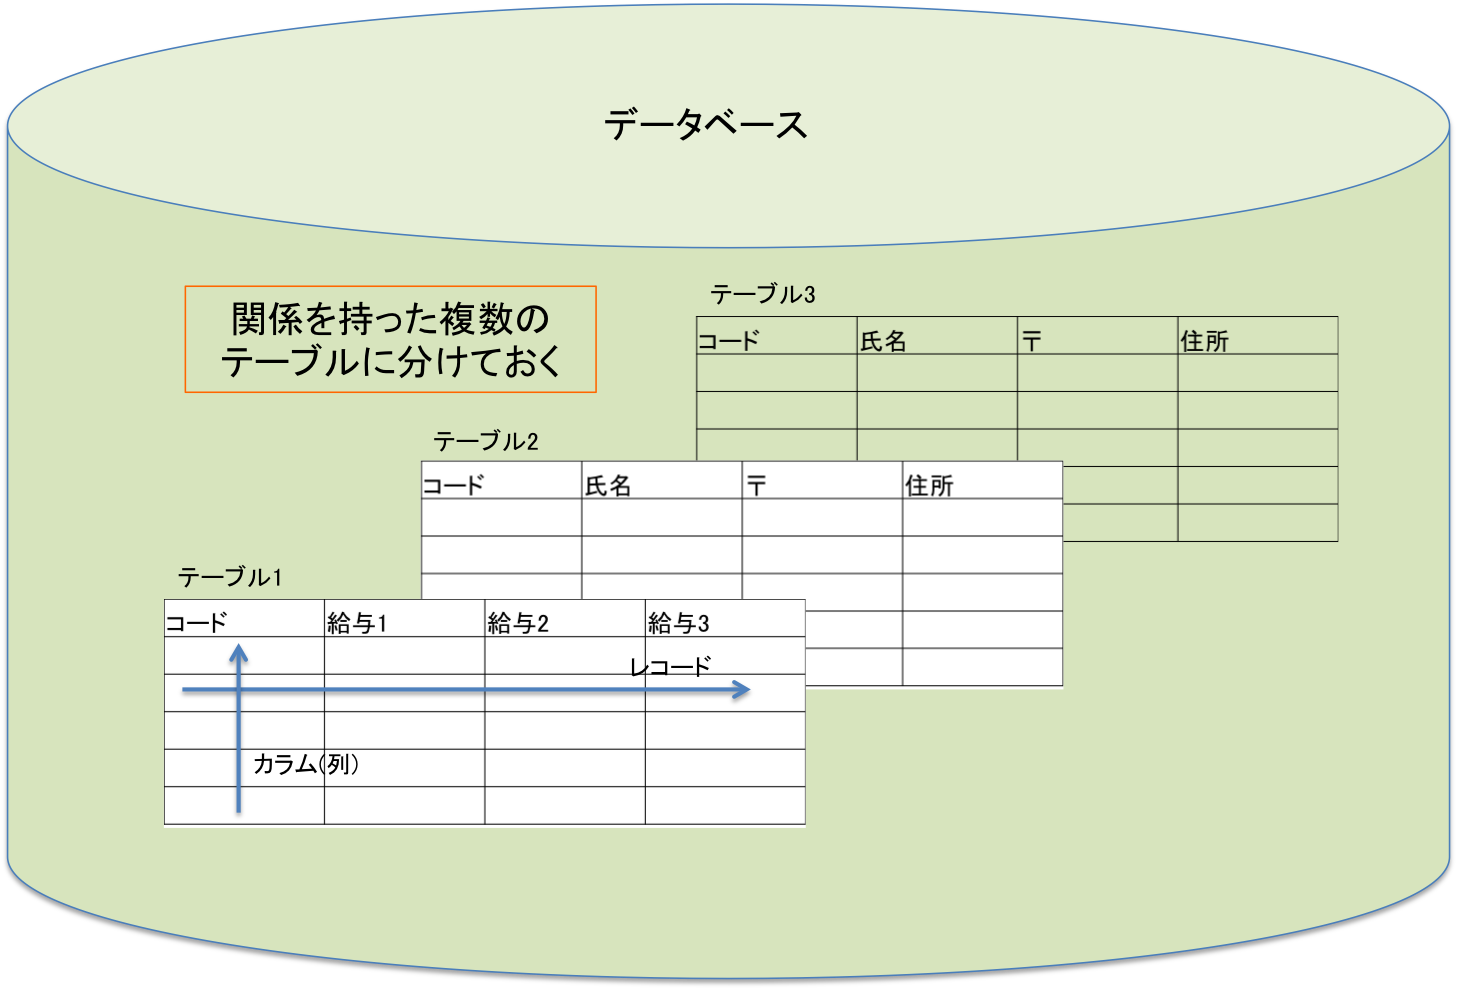 oracle relational database management system pdf